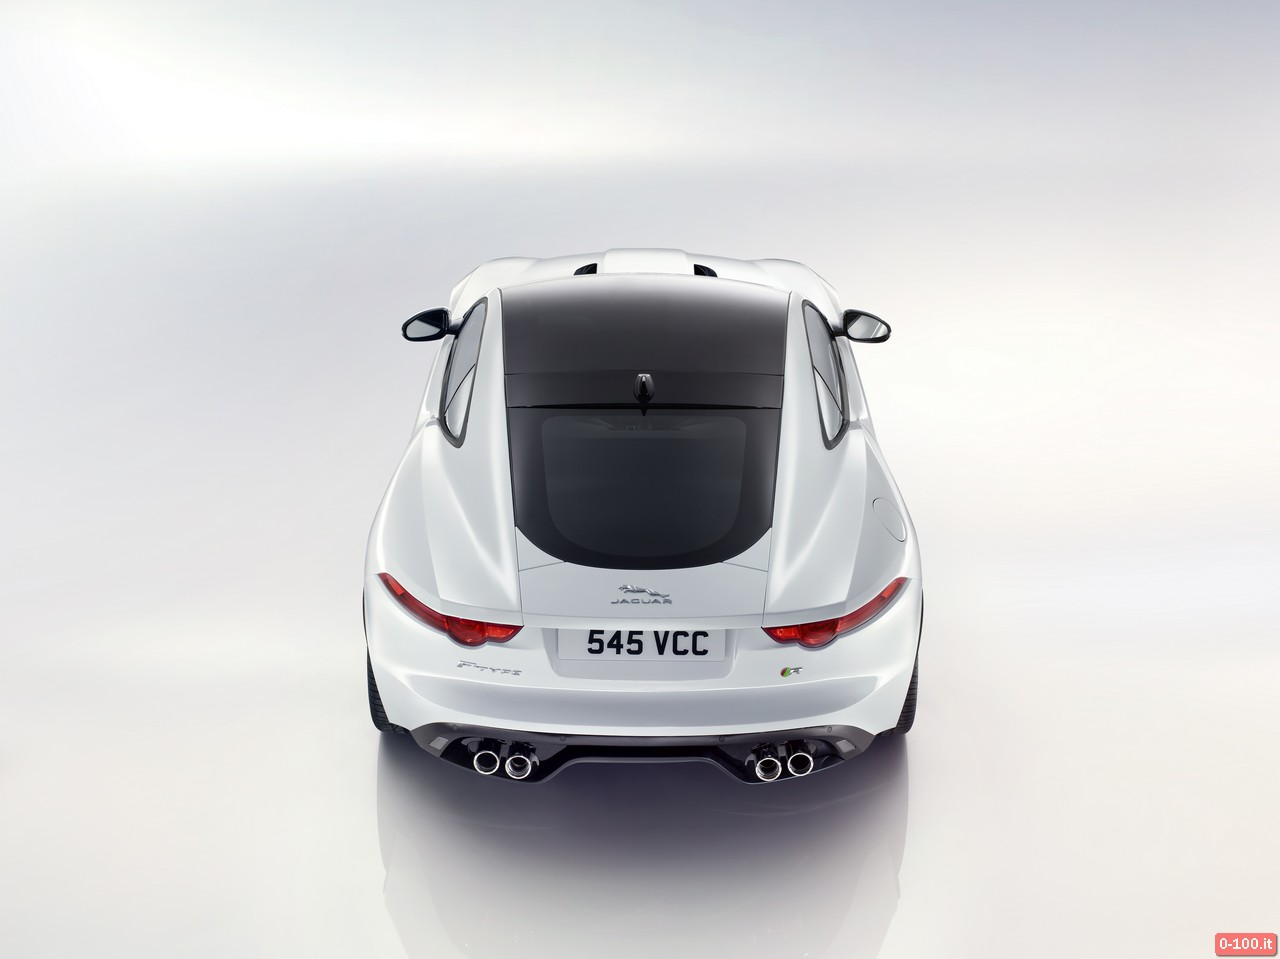 jaguar-f-type-r-coupe_price-prezzo-0-100_3